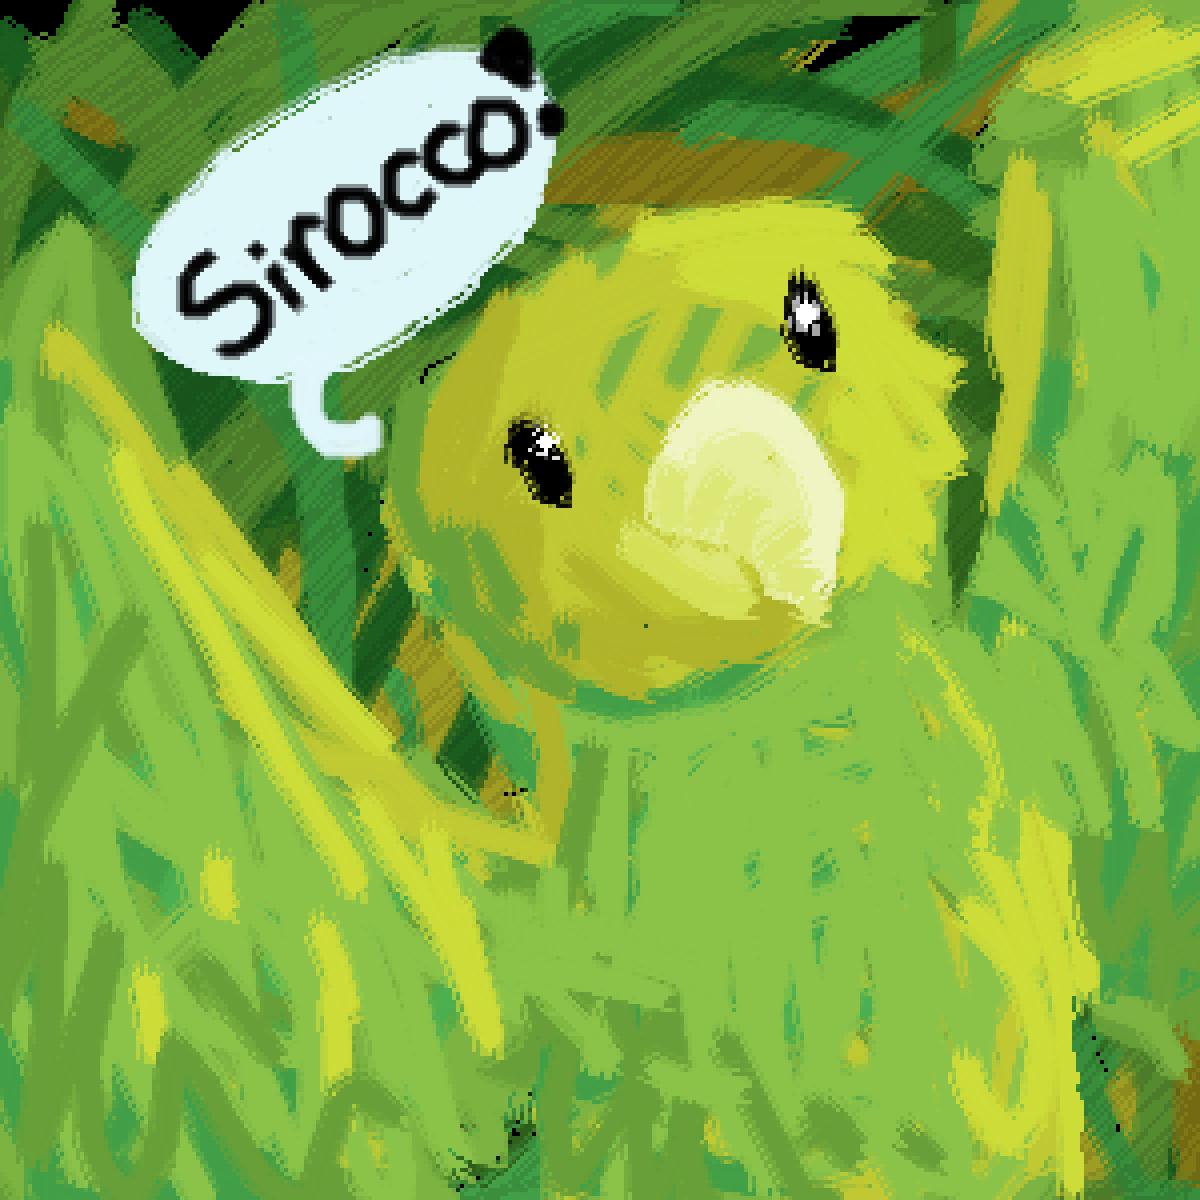 Kakapo!